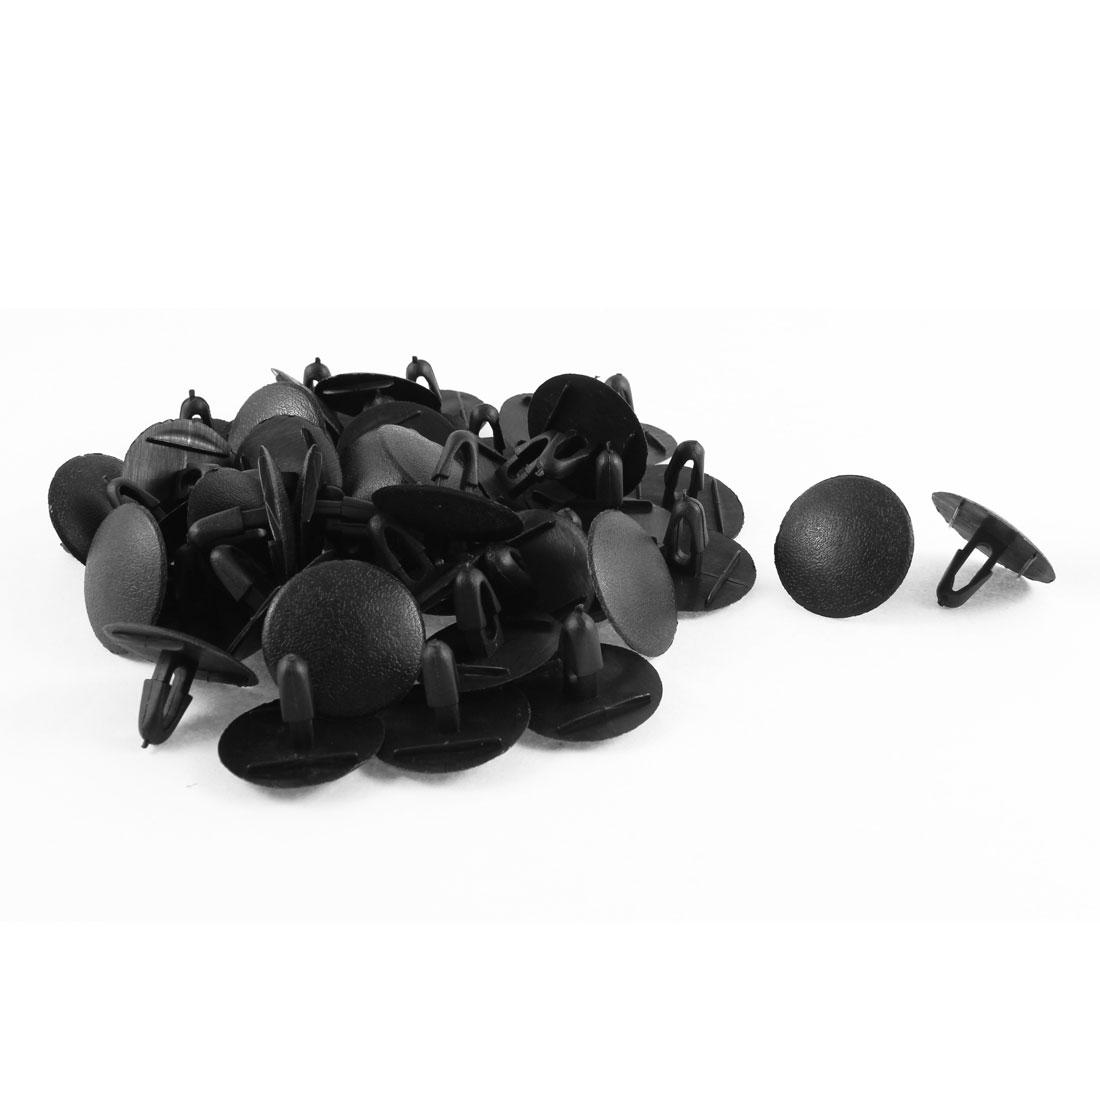 50 Pcs Black Plastic Push in Type Fastener Rivets Fender Clips 9mm Hole for Toyota